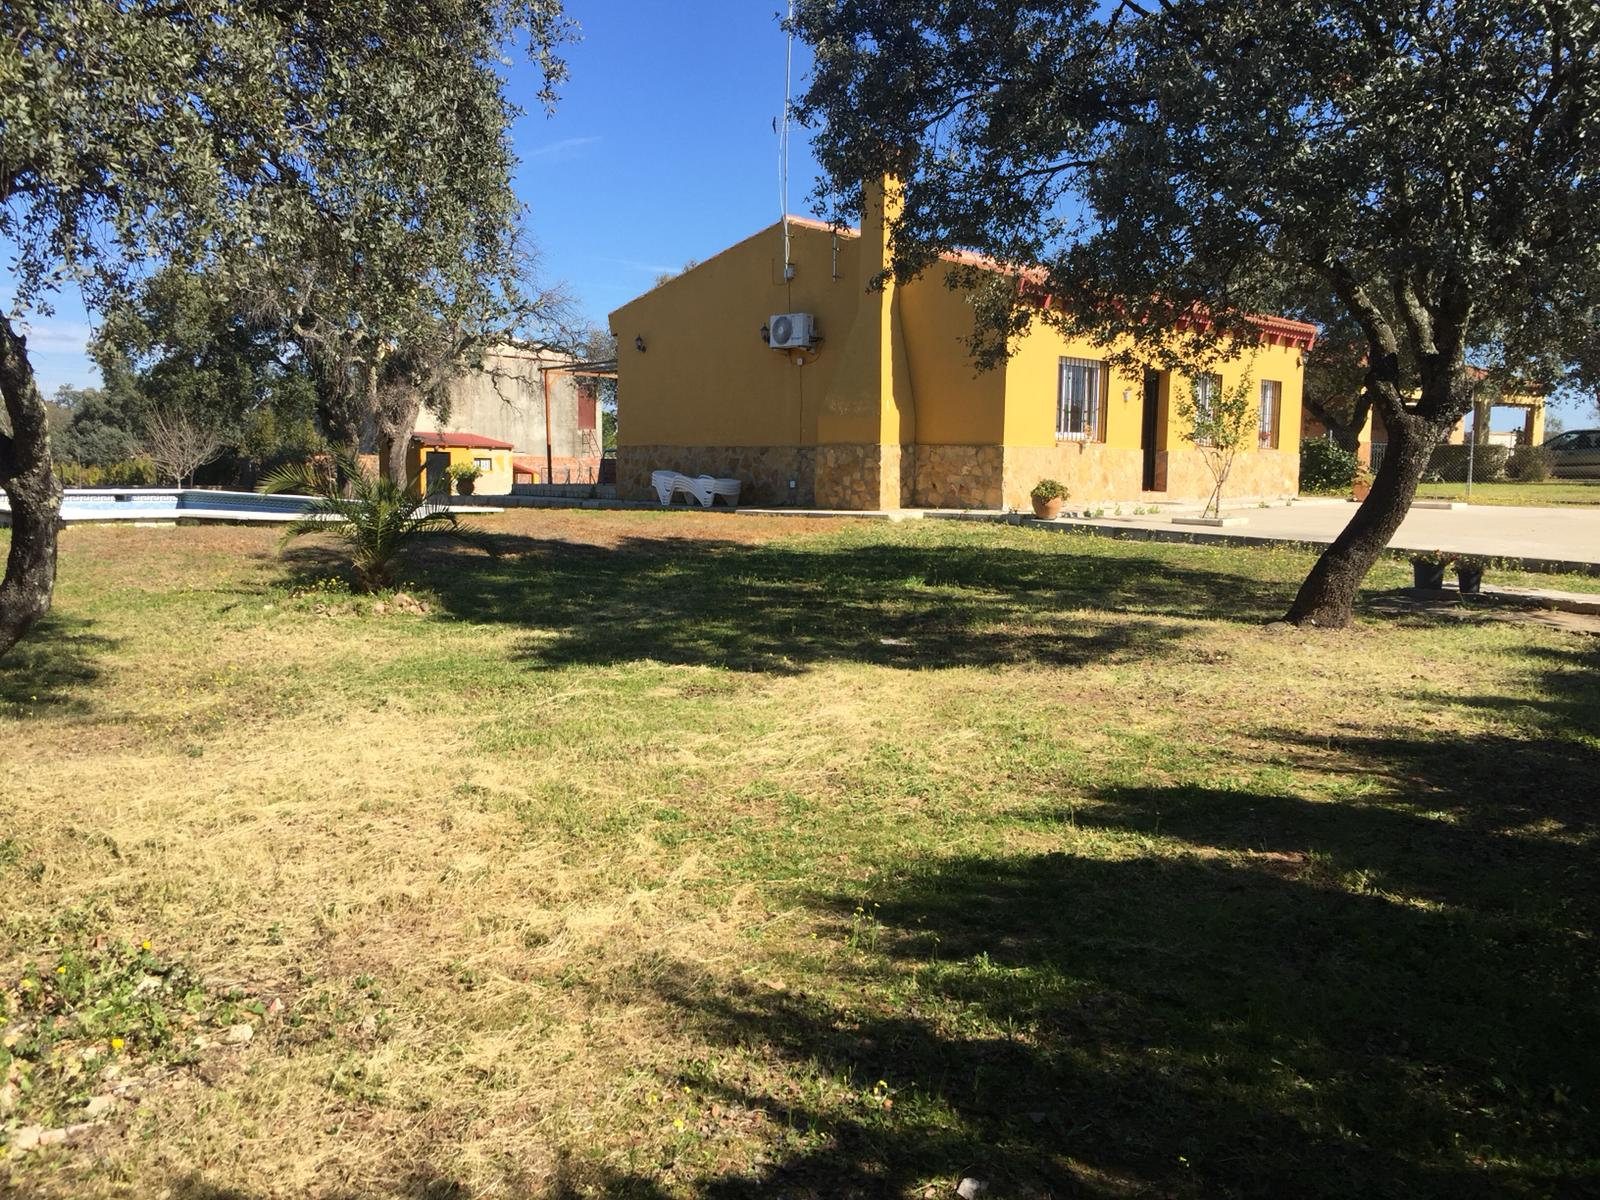 Parcela en sevilla sierra norte castilblanco sn57 for Parcelas para alquilar en sevilla